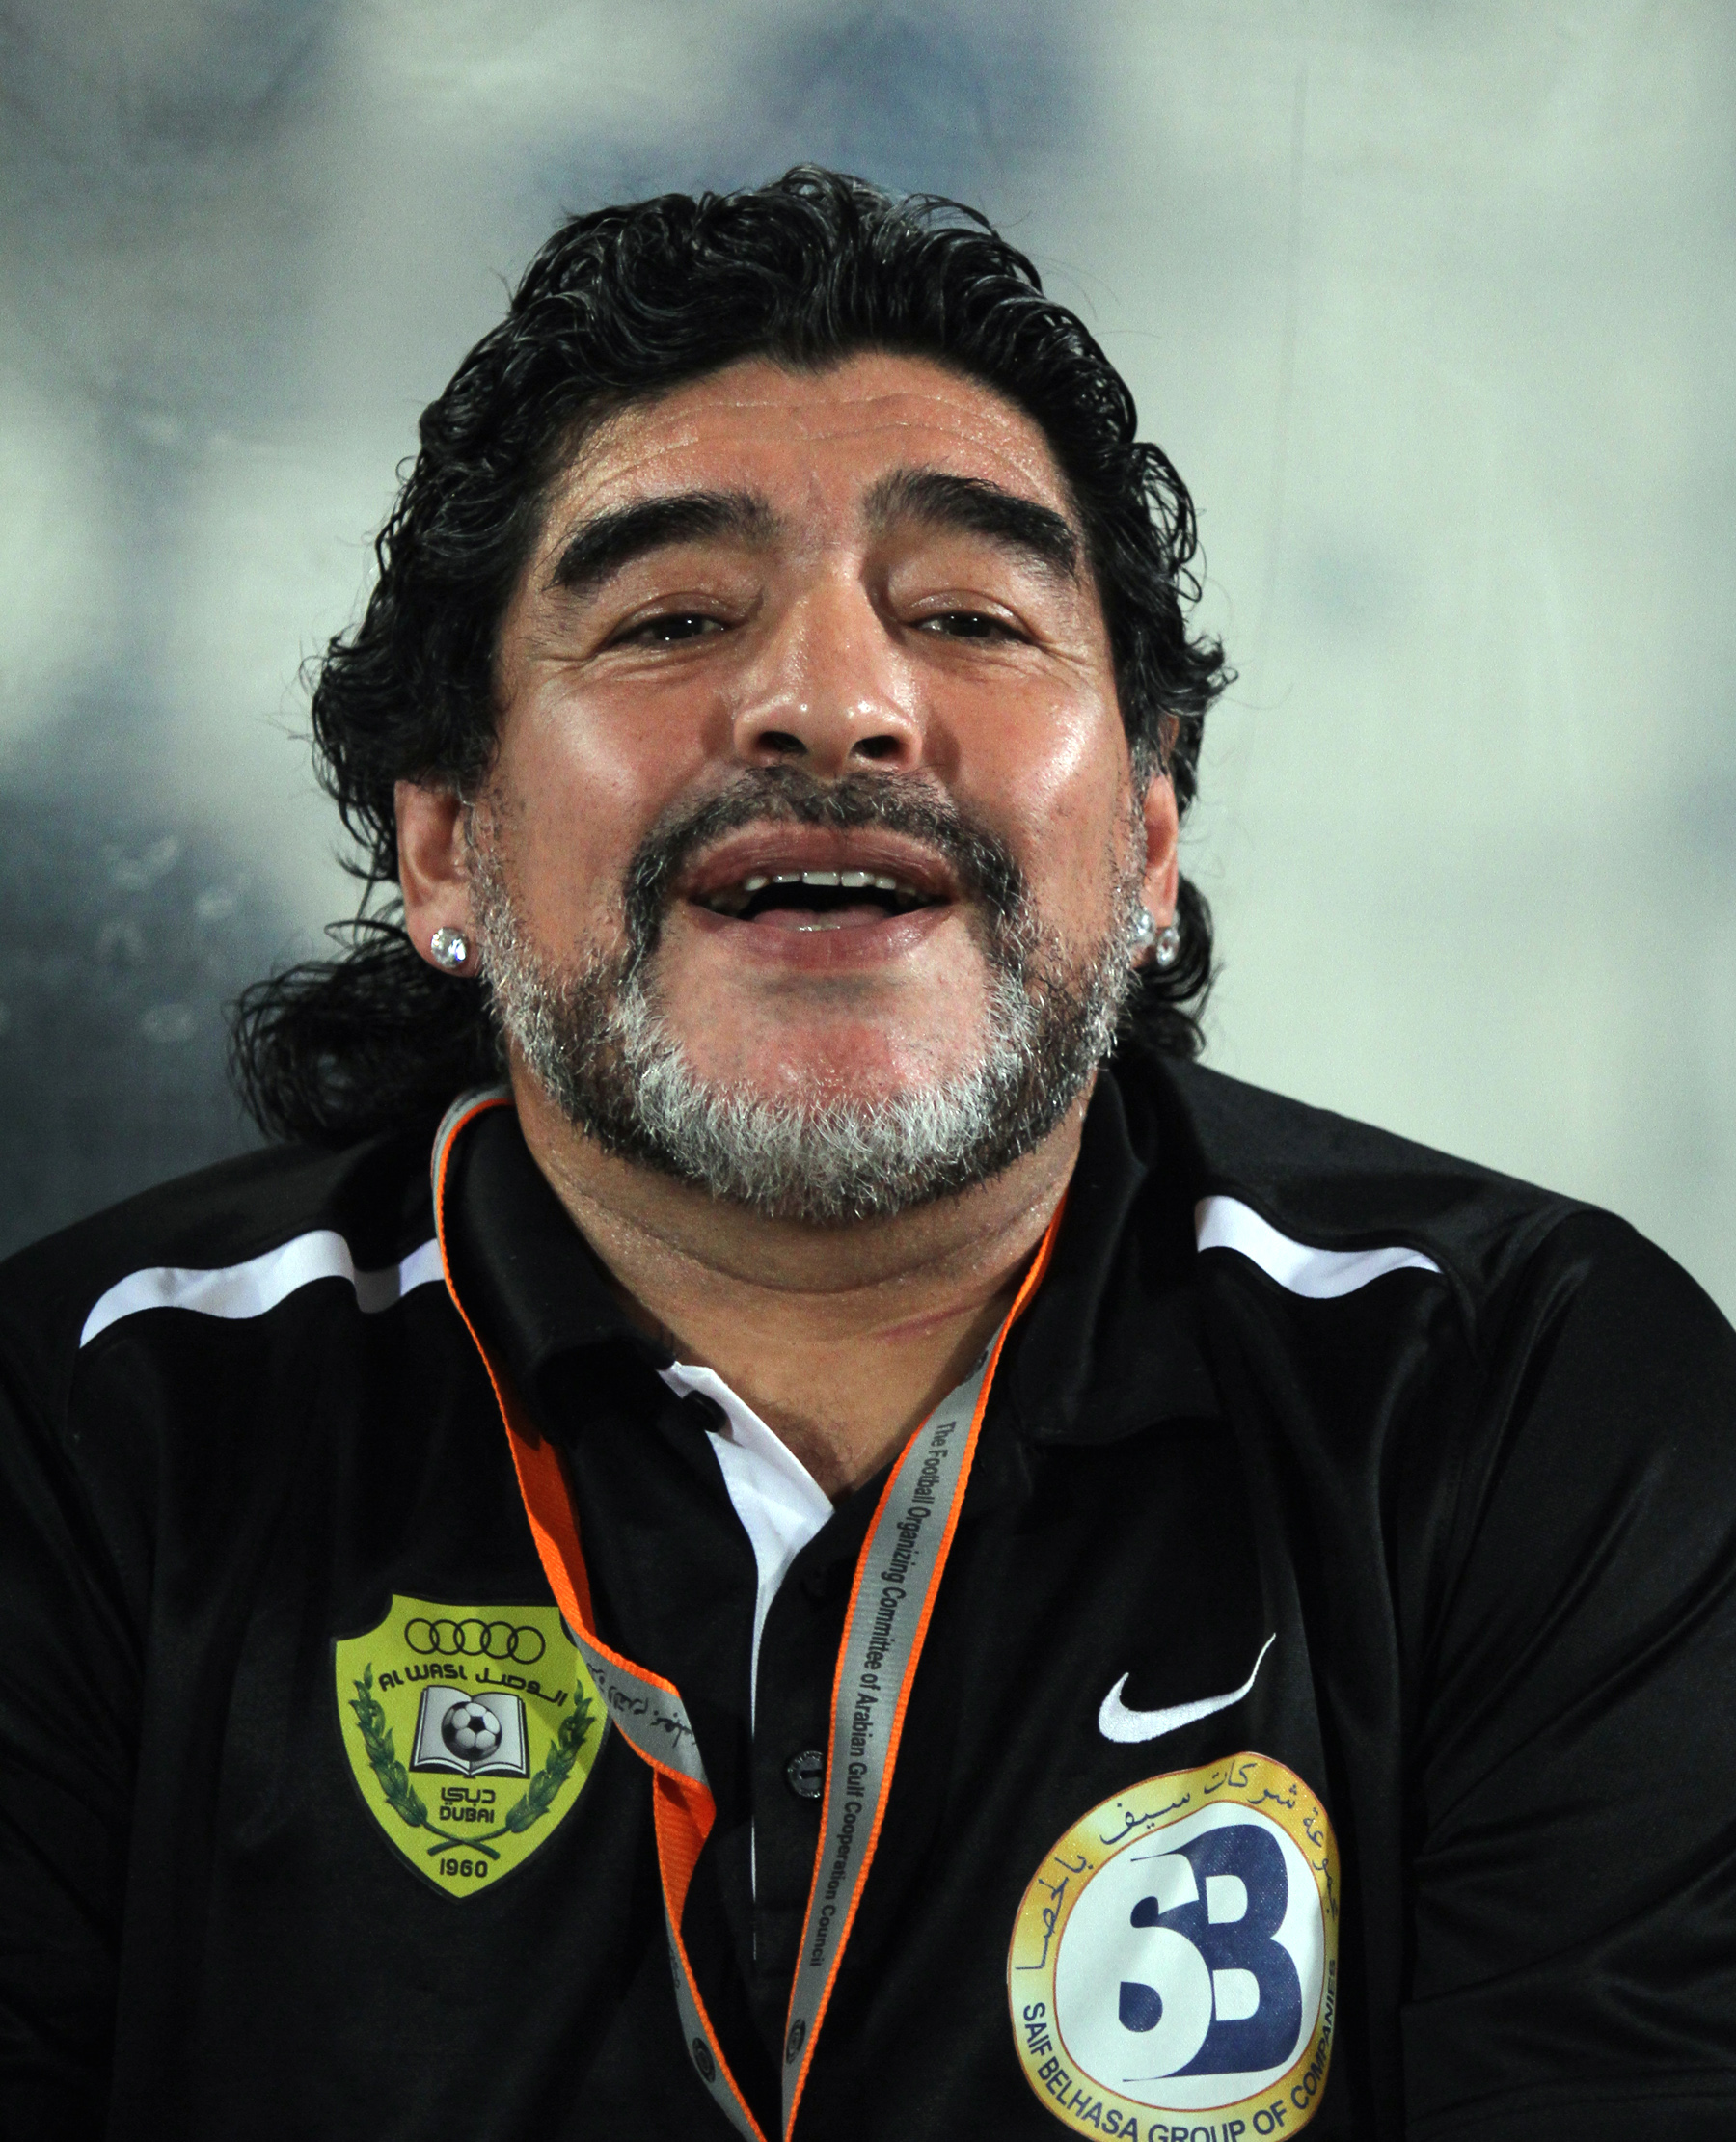 Naples unites in grief over death of adoptive son Maradona